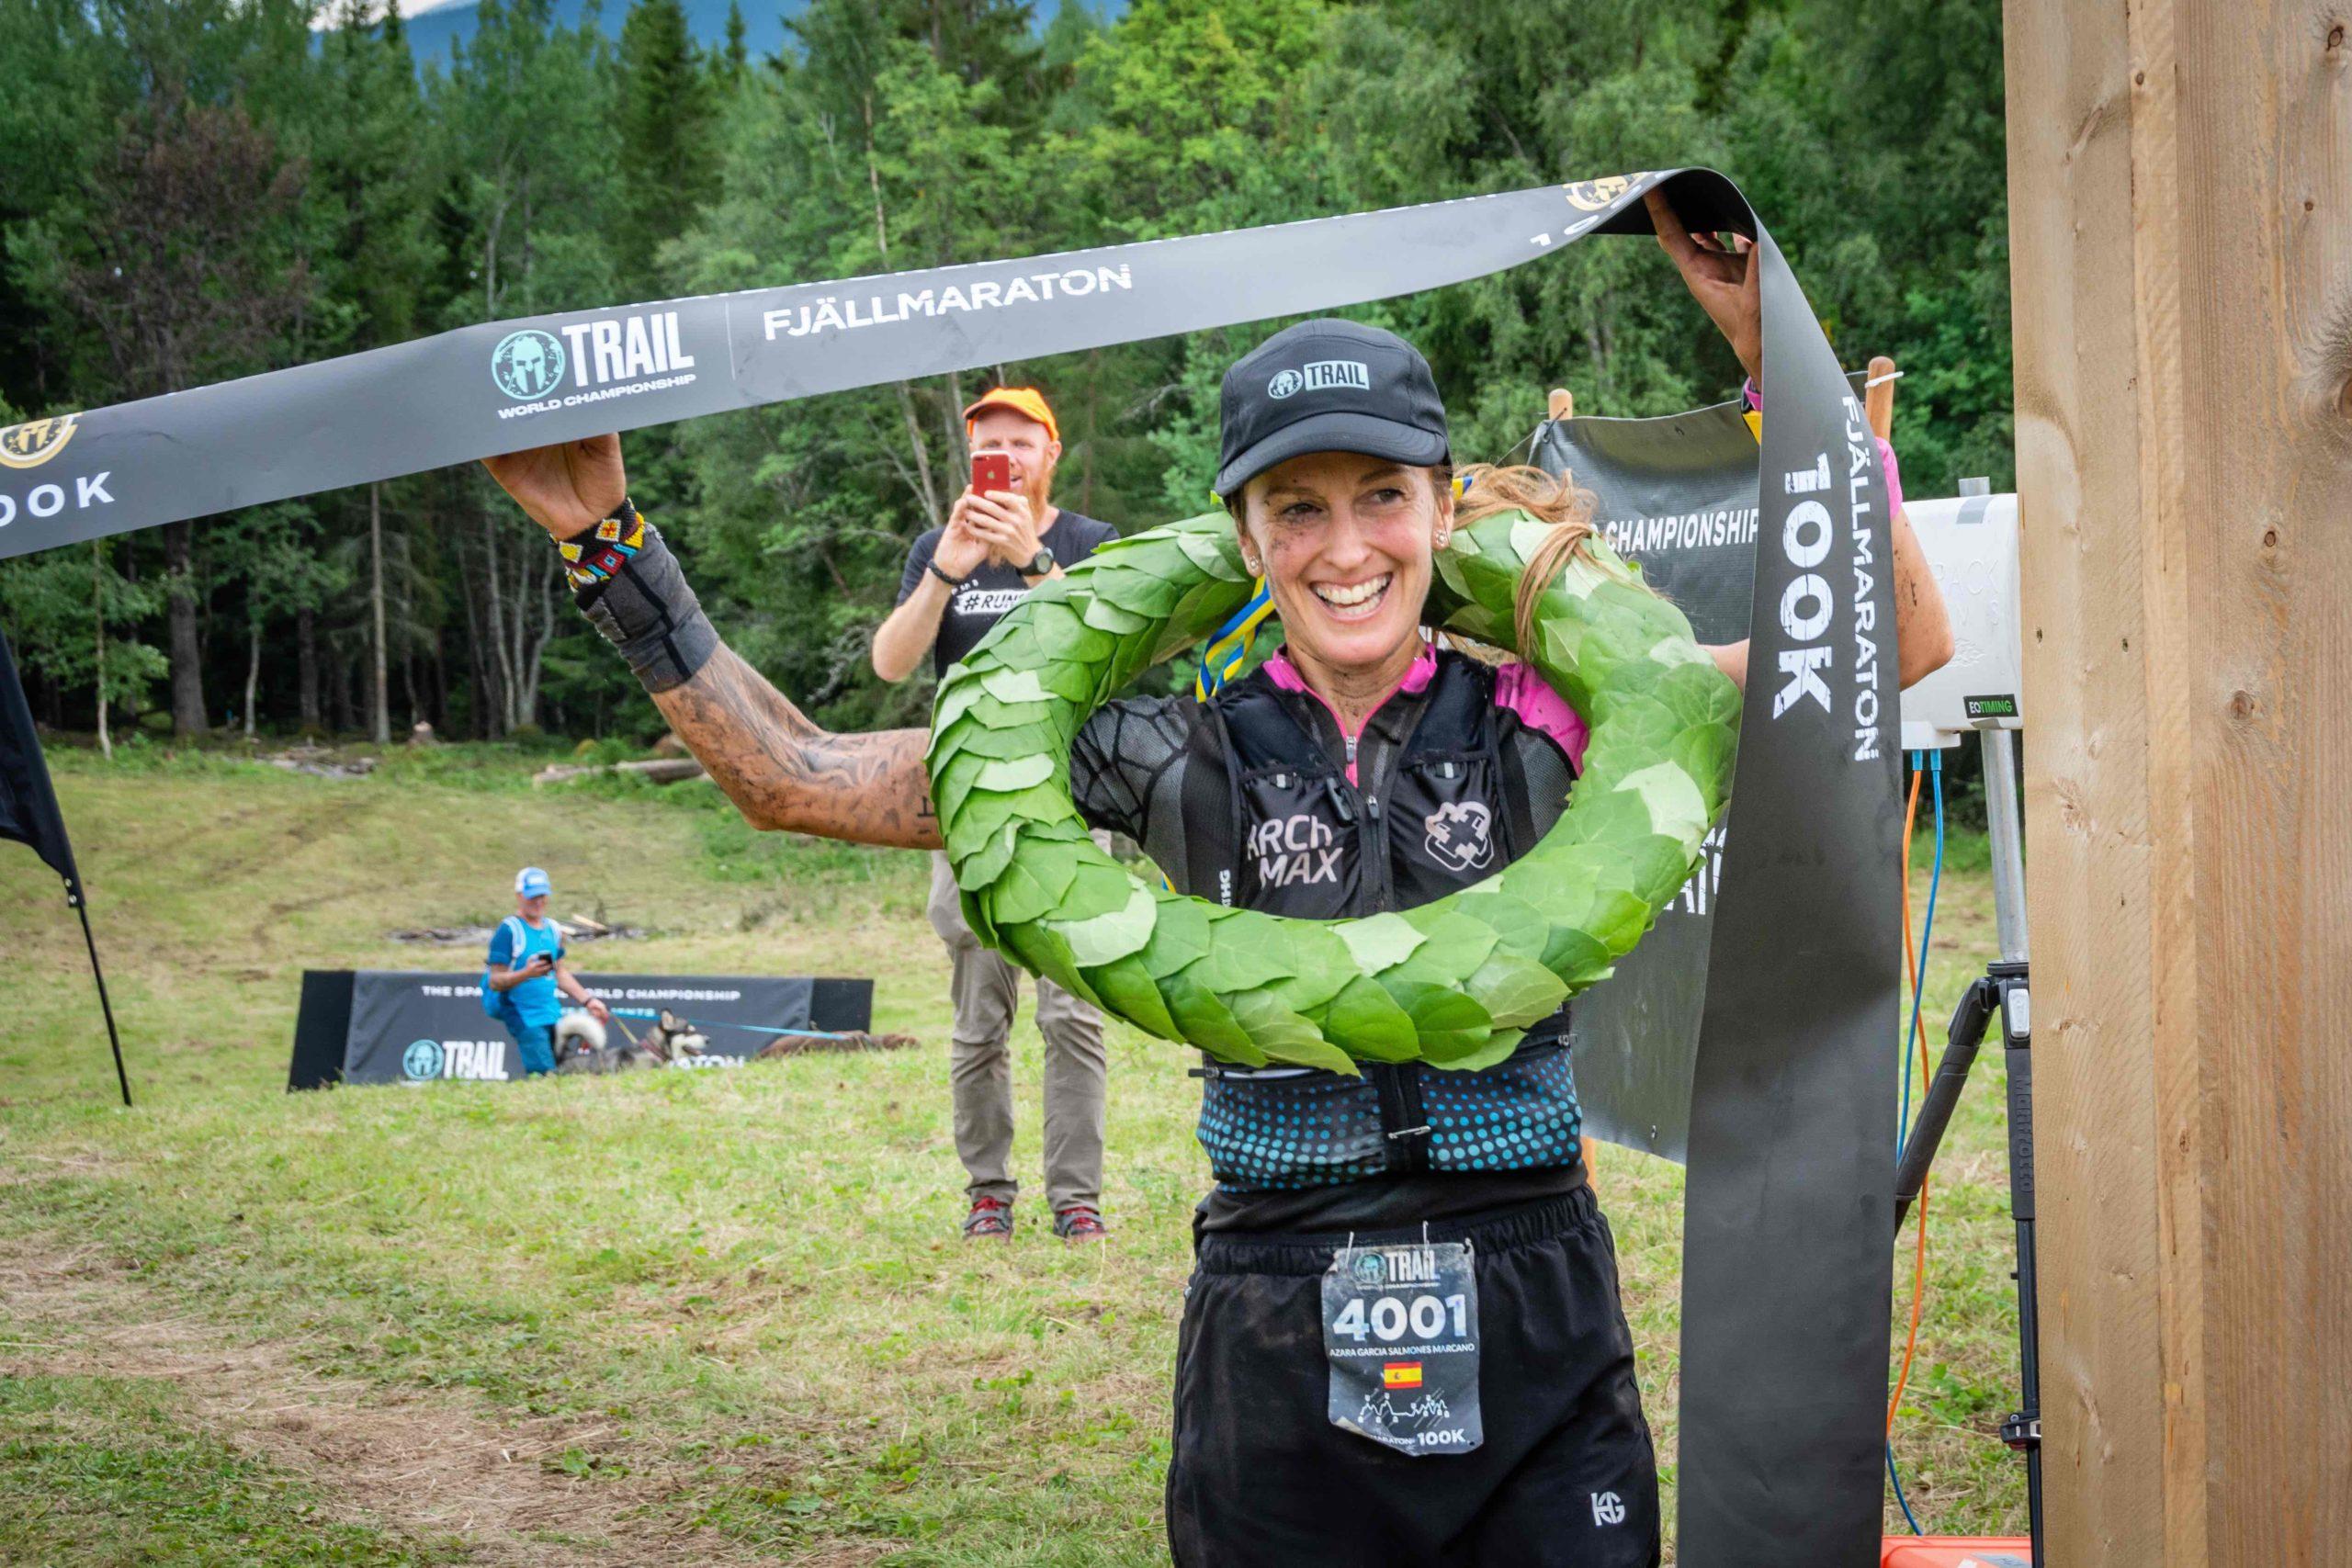 Spartan Trail World Championship Kicks off at Sweden's Fjällmaraton — ATRA